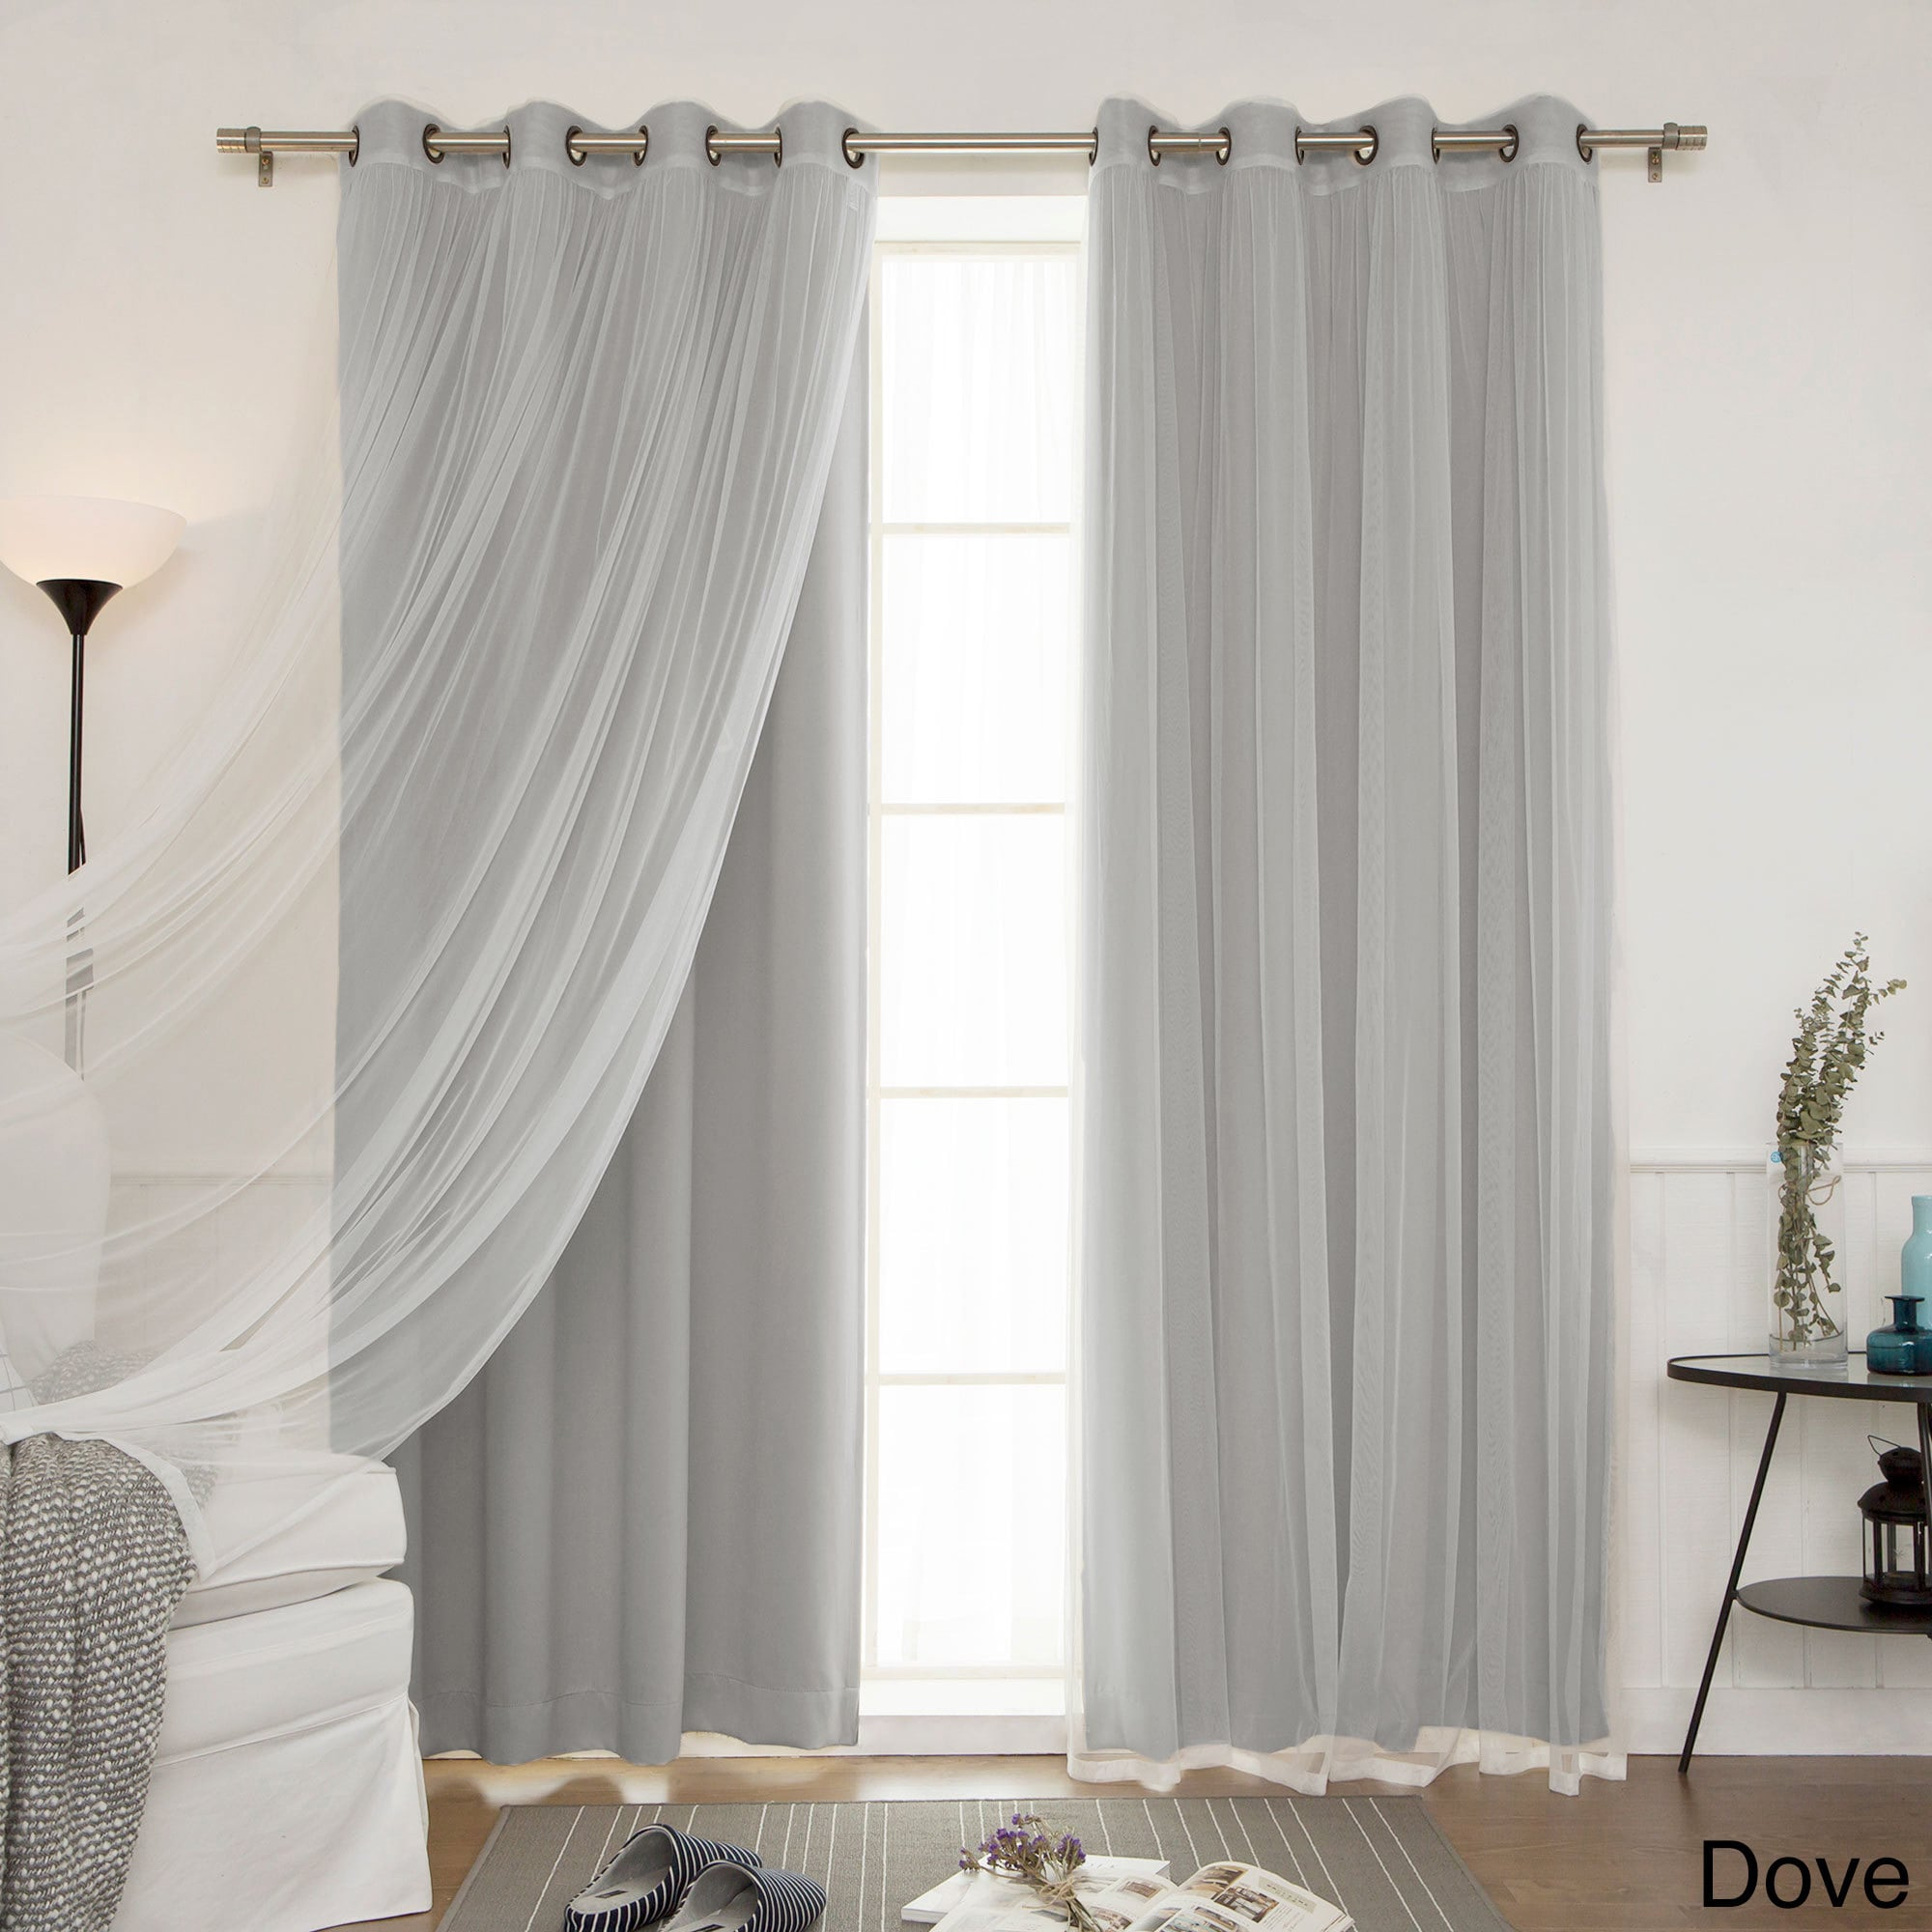 Shop Aurora Home Mix and Match Blackout Blackout Curtains Panel ...